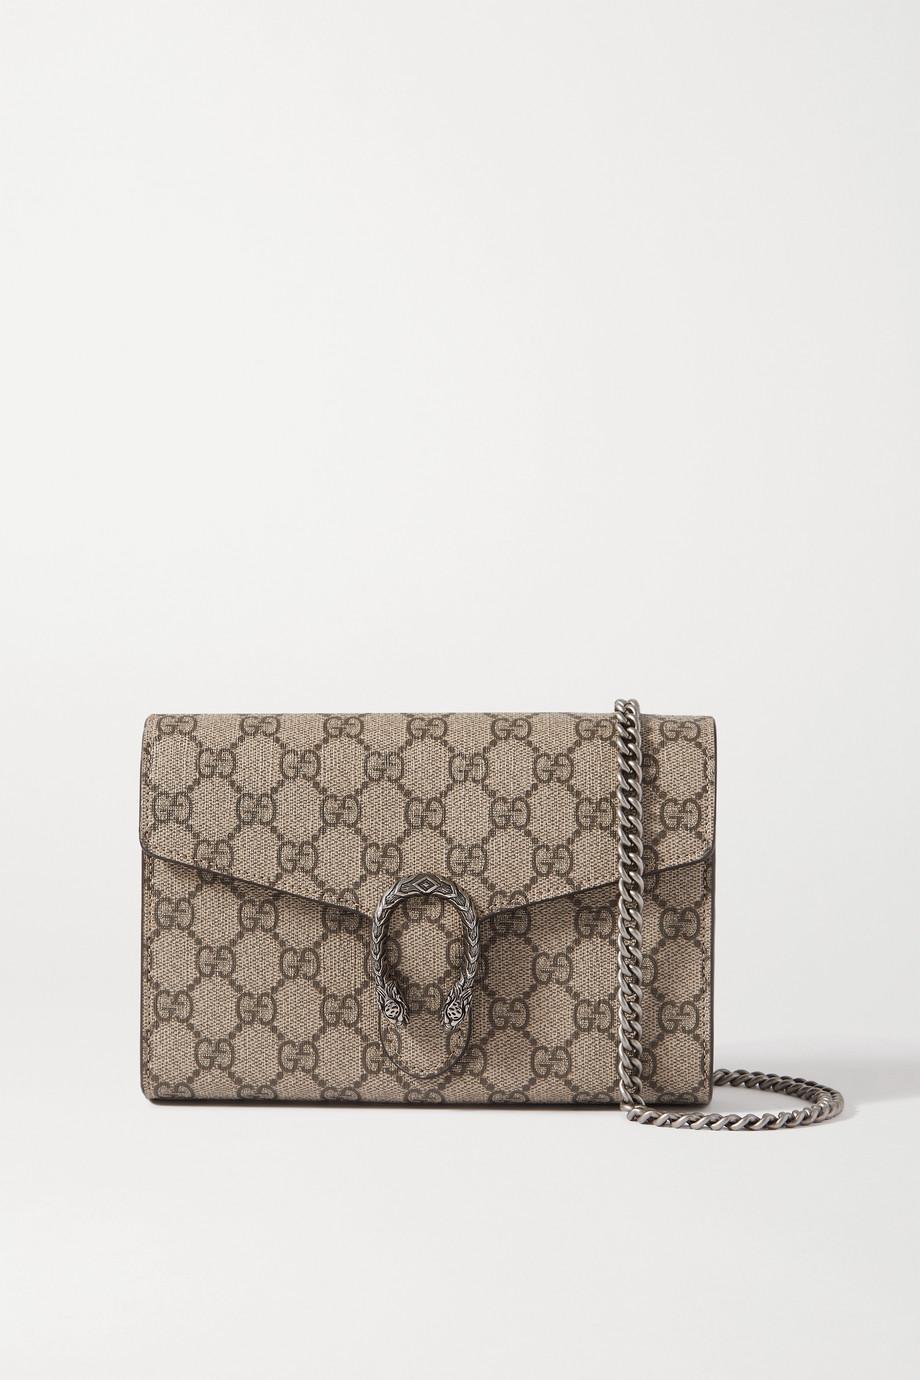 Gucci Dionysus printed coated-canvas shoulder bag